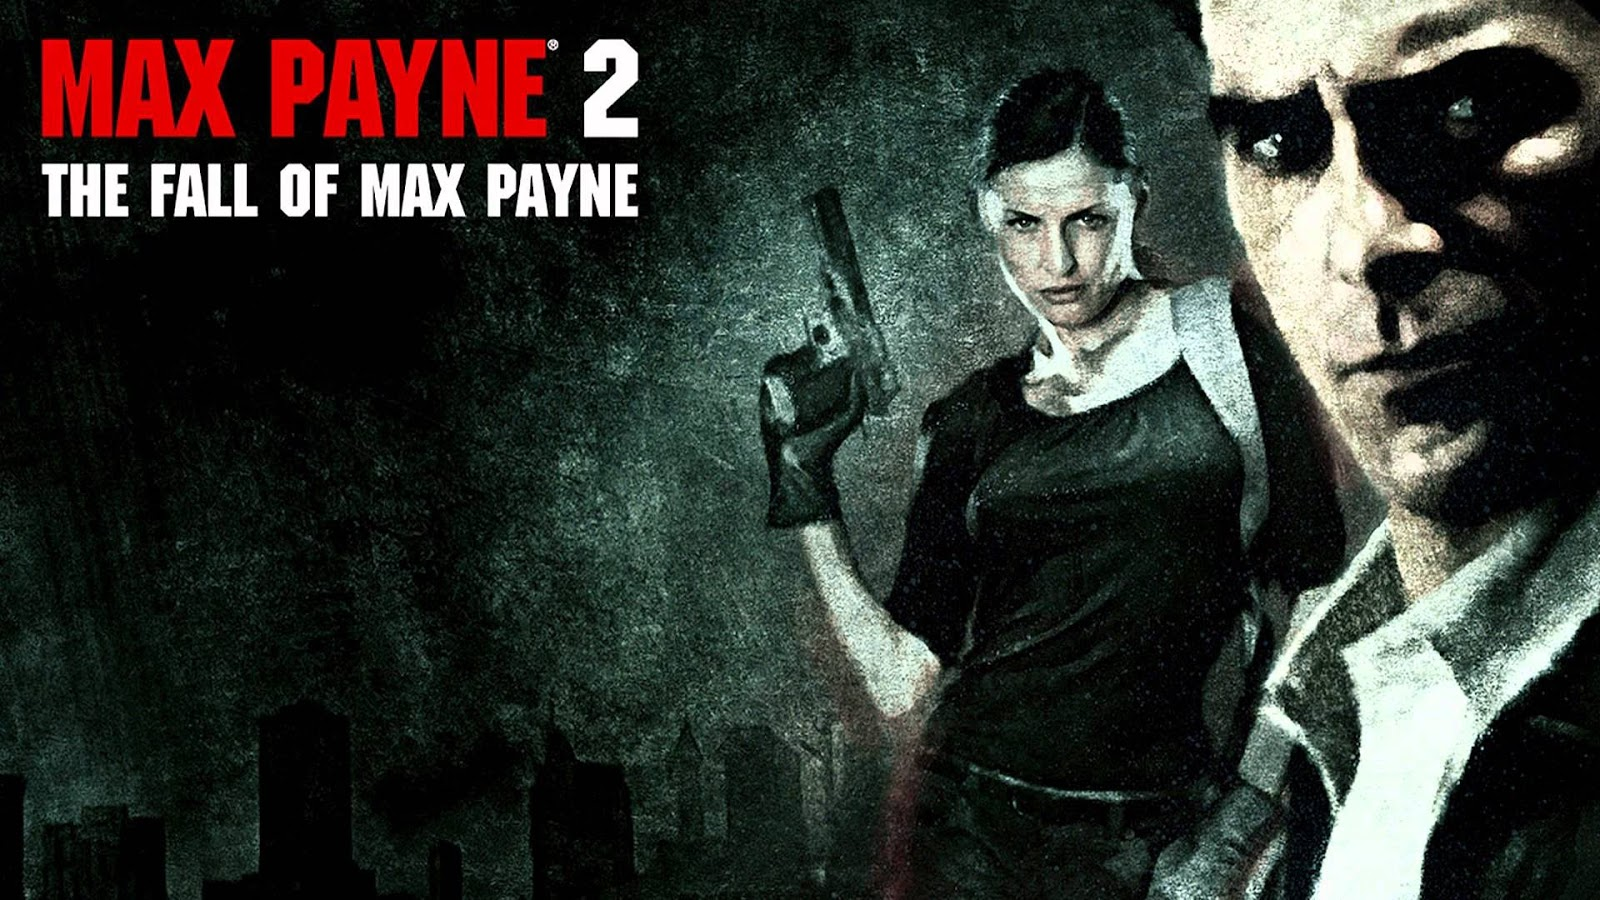 Max payne 2 game faq game speedball 2